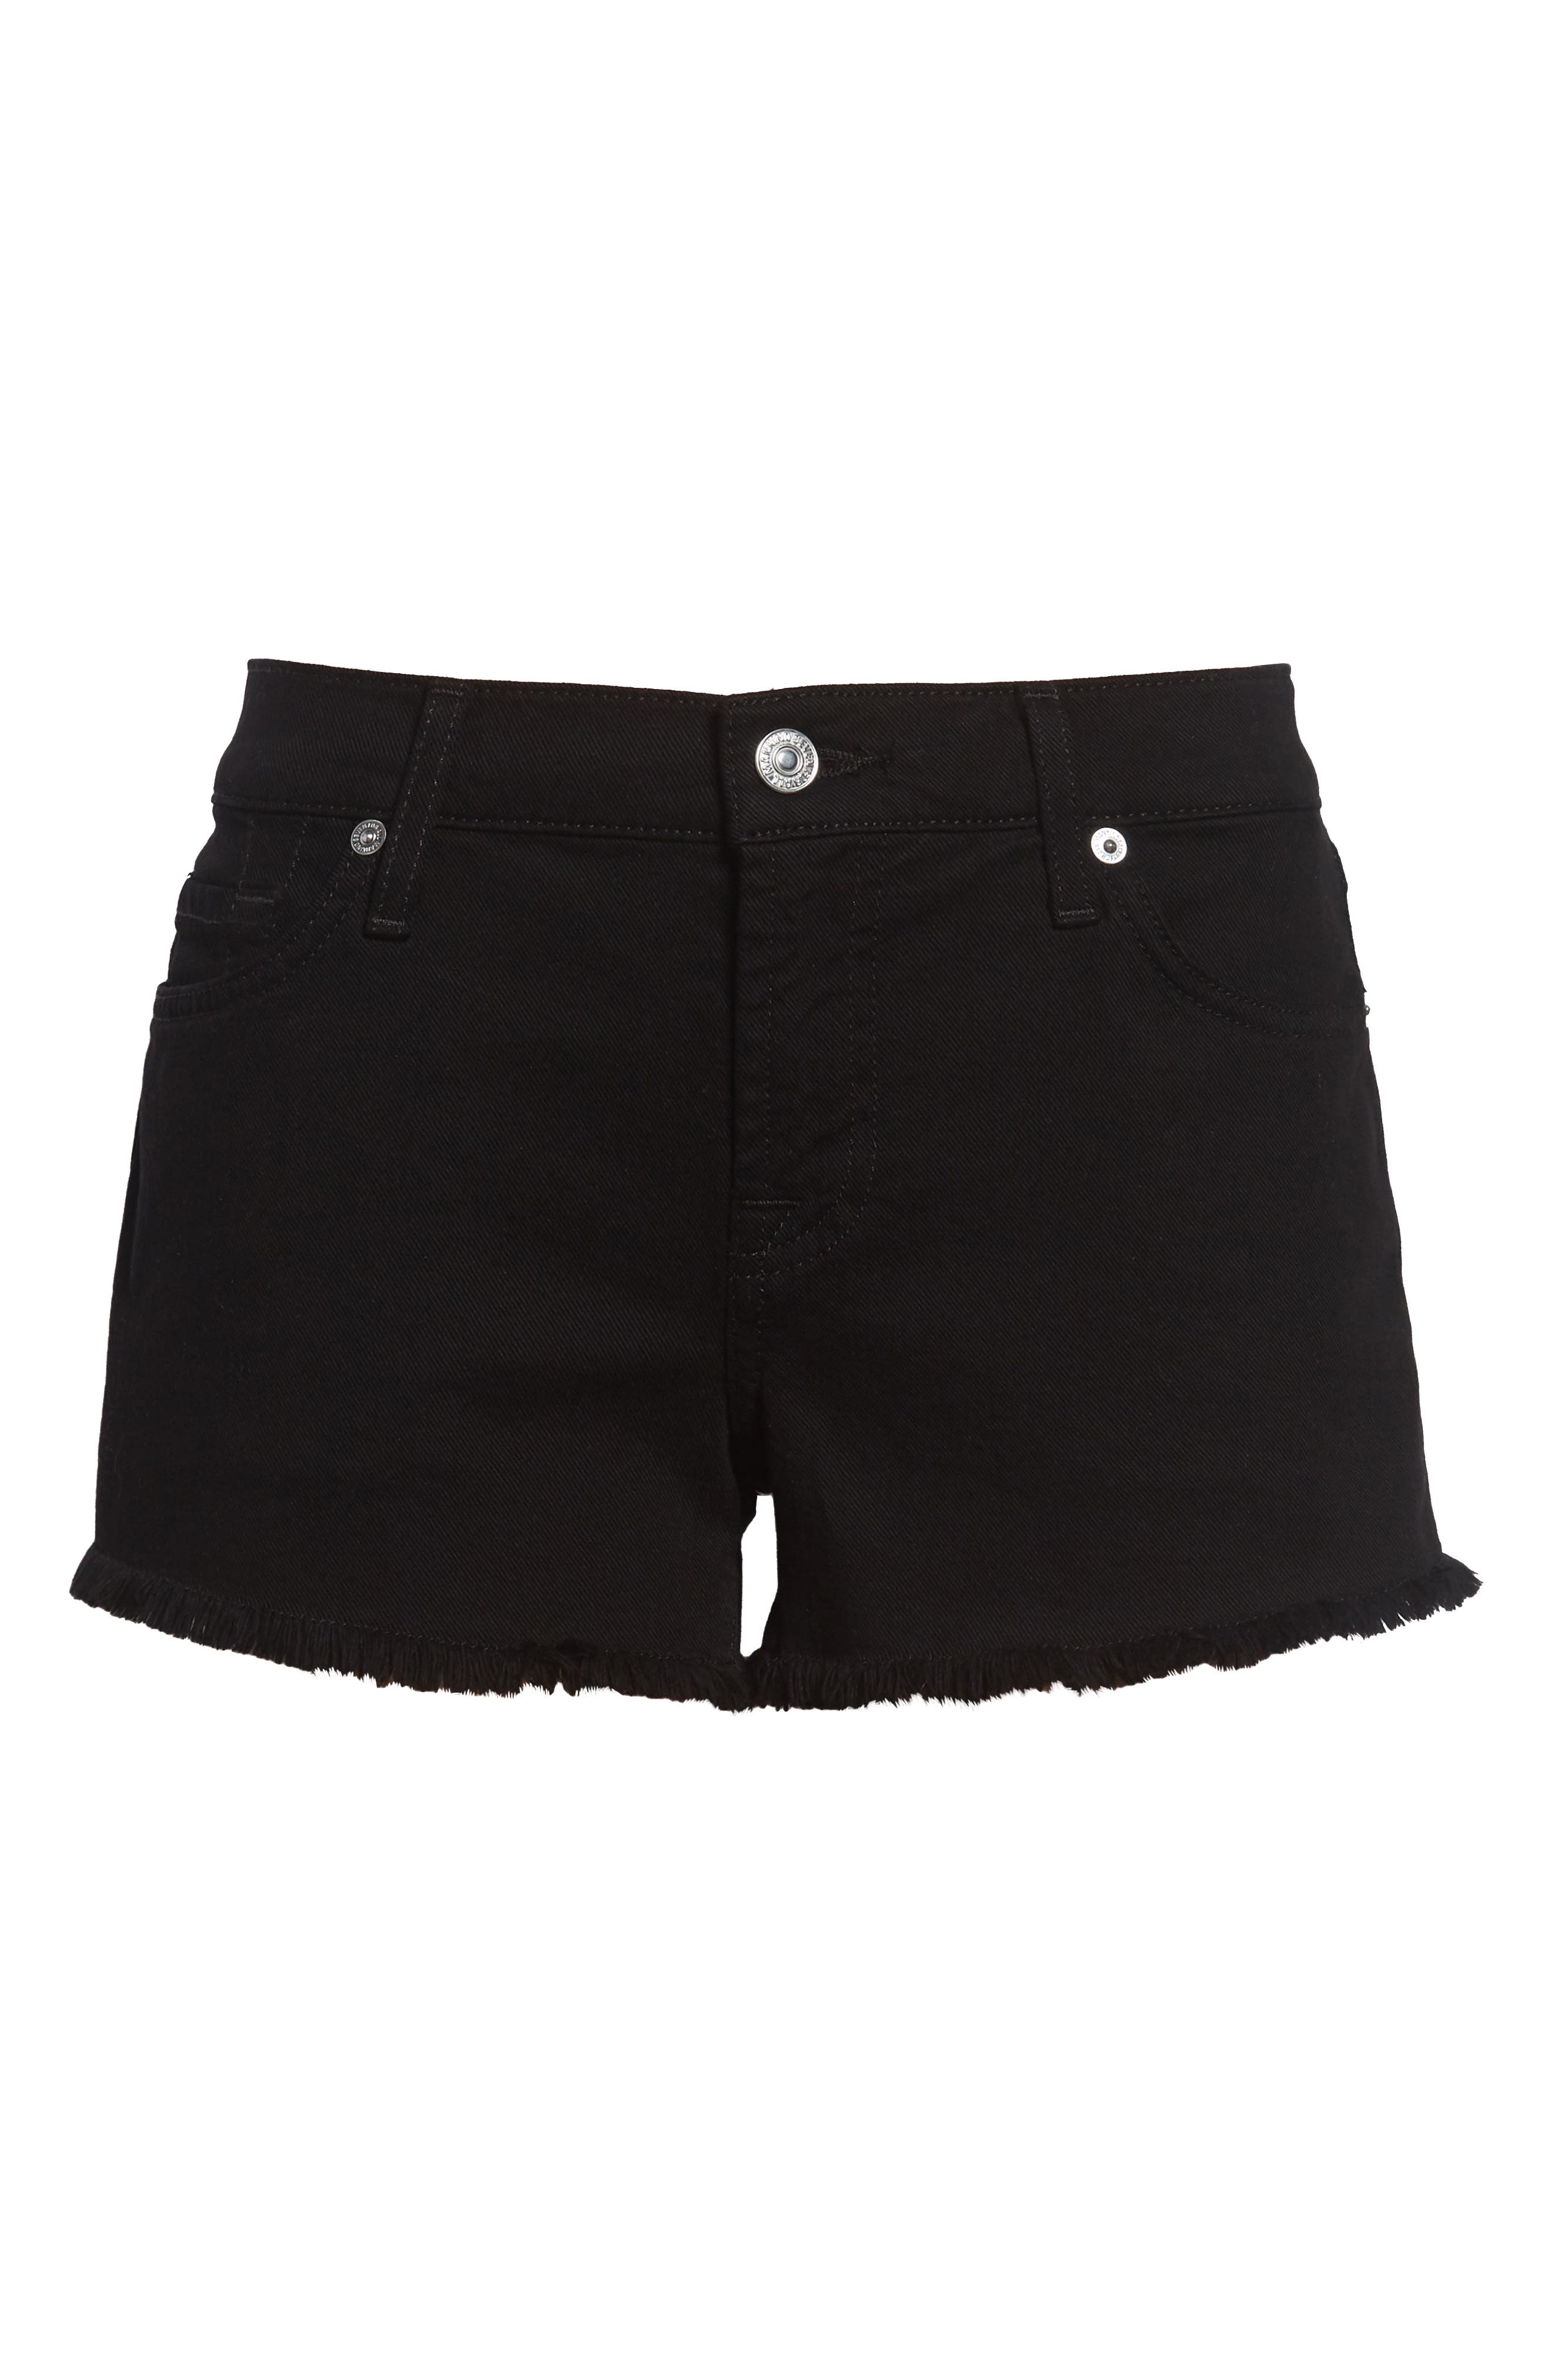 Cutoff Shorts,                             Alternate thumbnail 2, color,                             BLACK